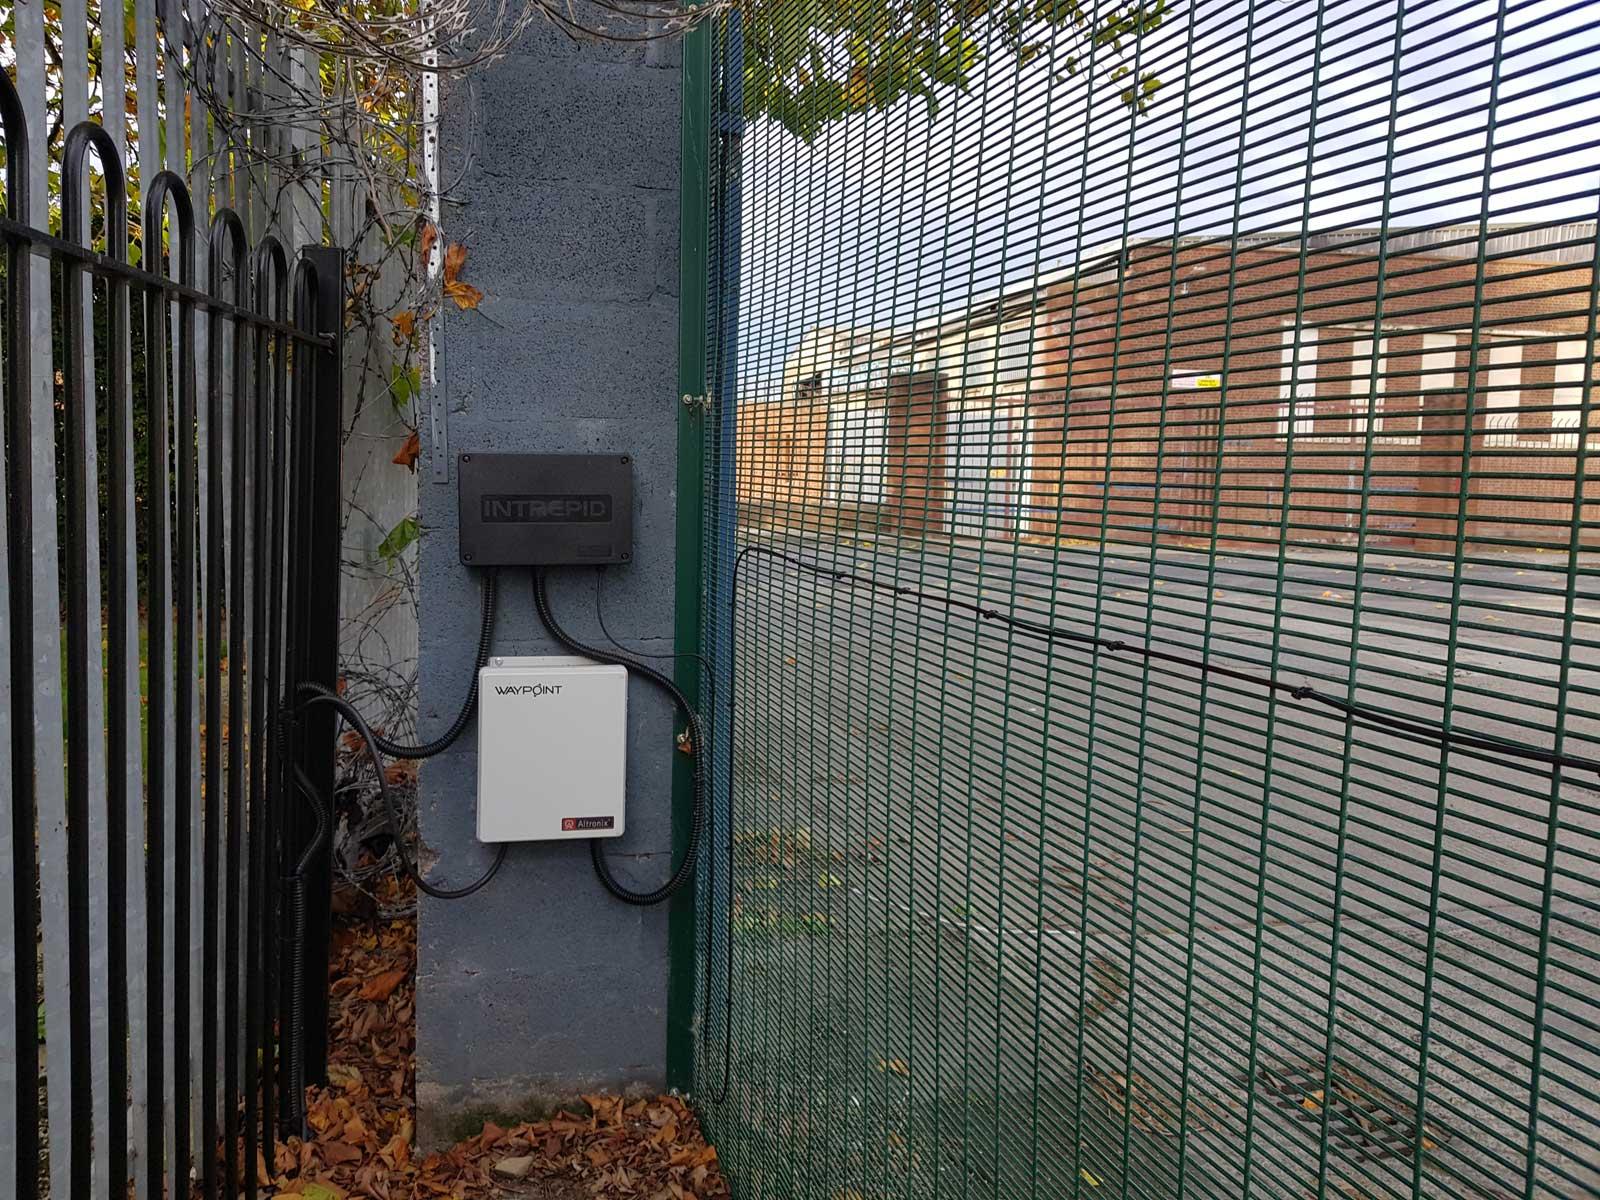 Irish Fencing Services Product Demo Area Intrepid PID On Kilmainham 358 Prison Mesh (16)